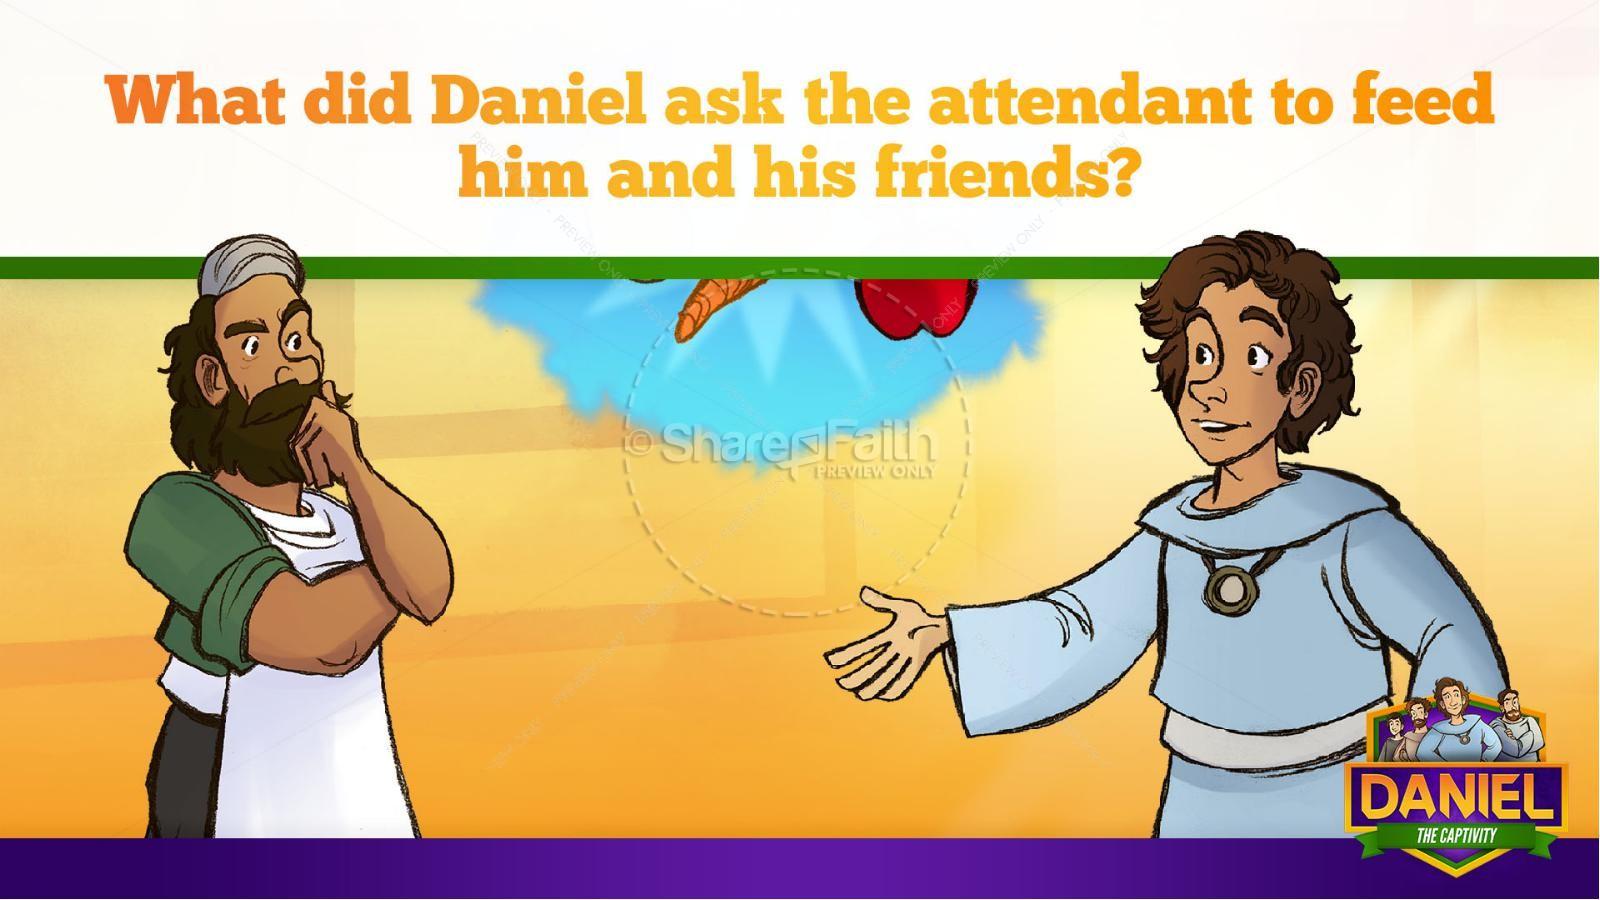 Daniel 1 The Captivity Kids Bible Story | slide 27